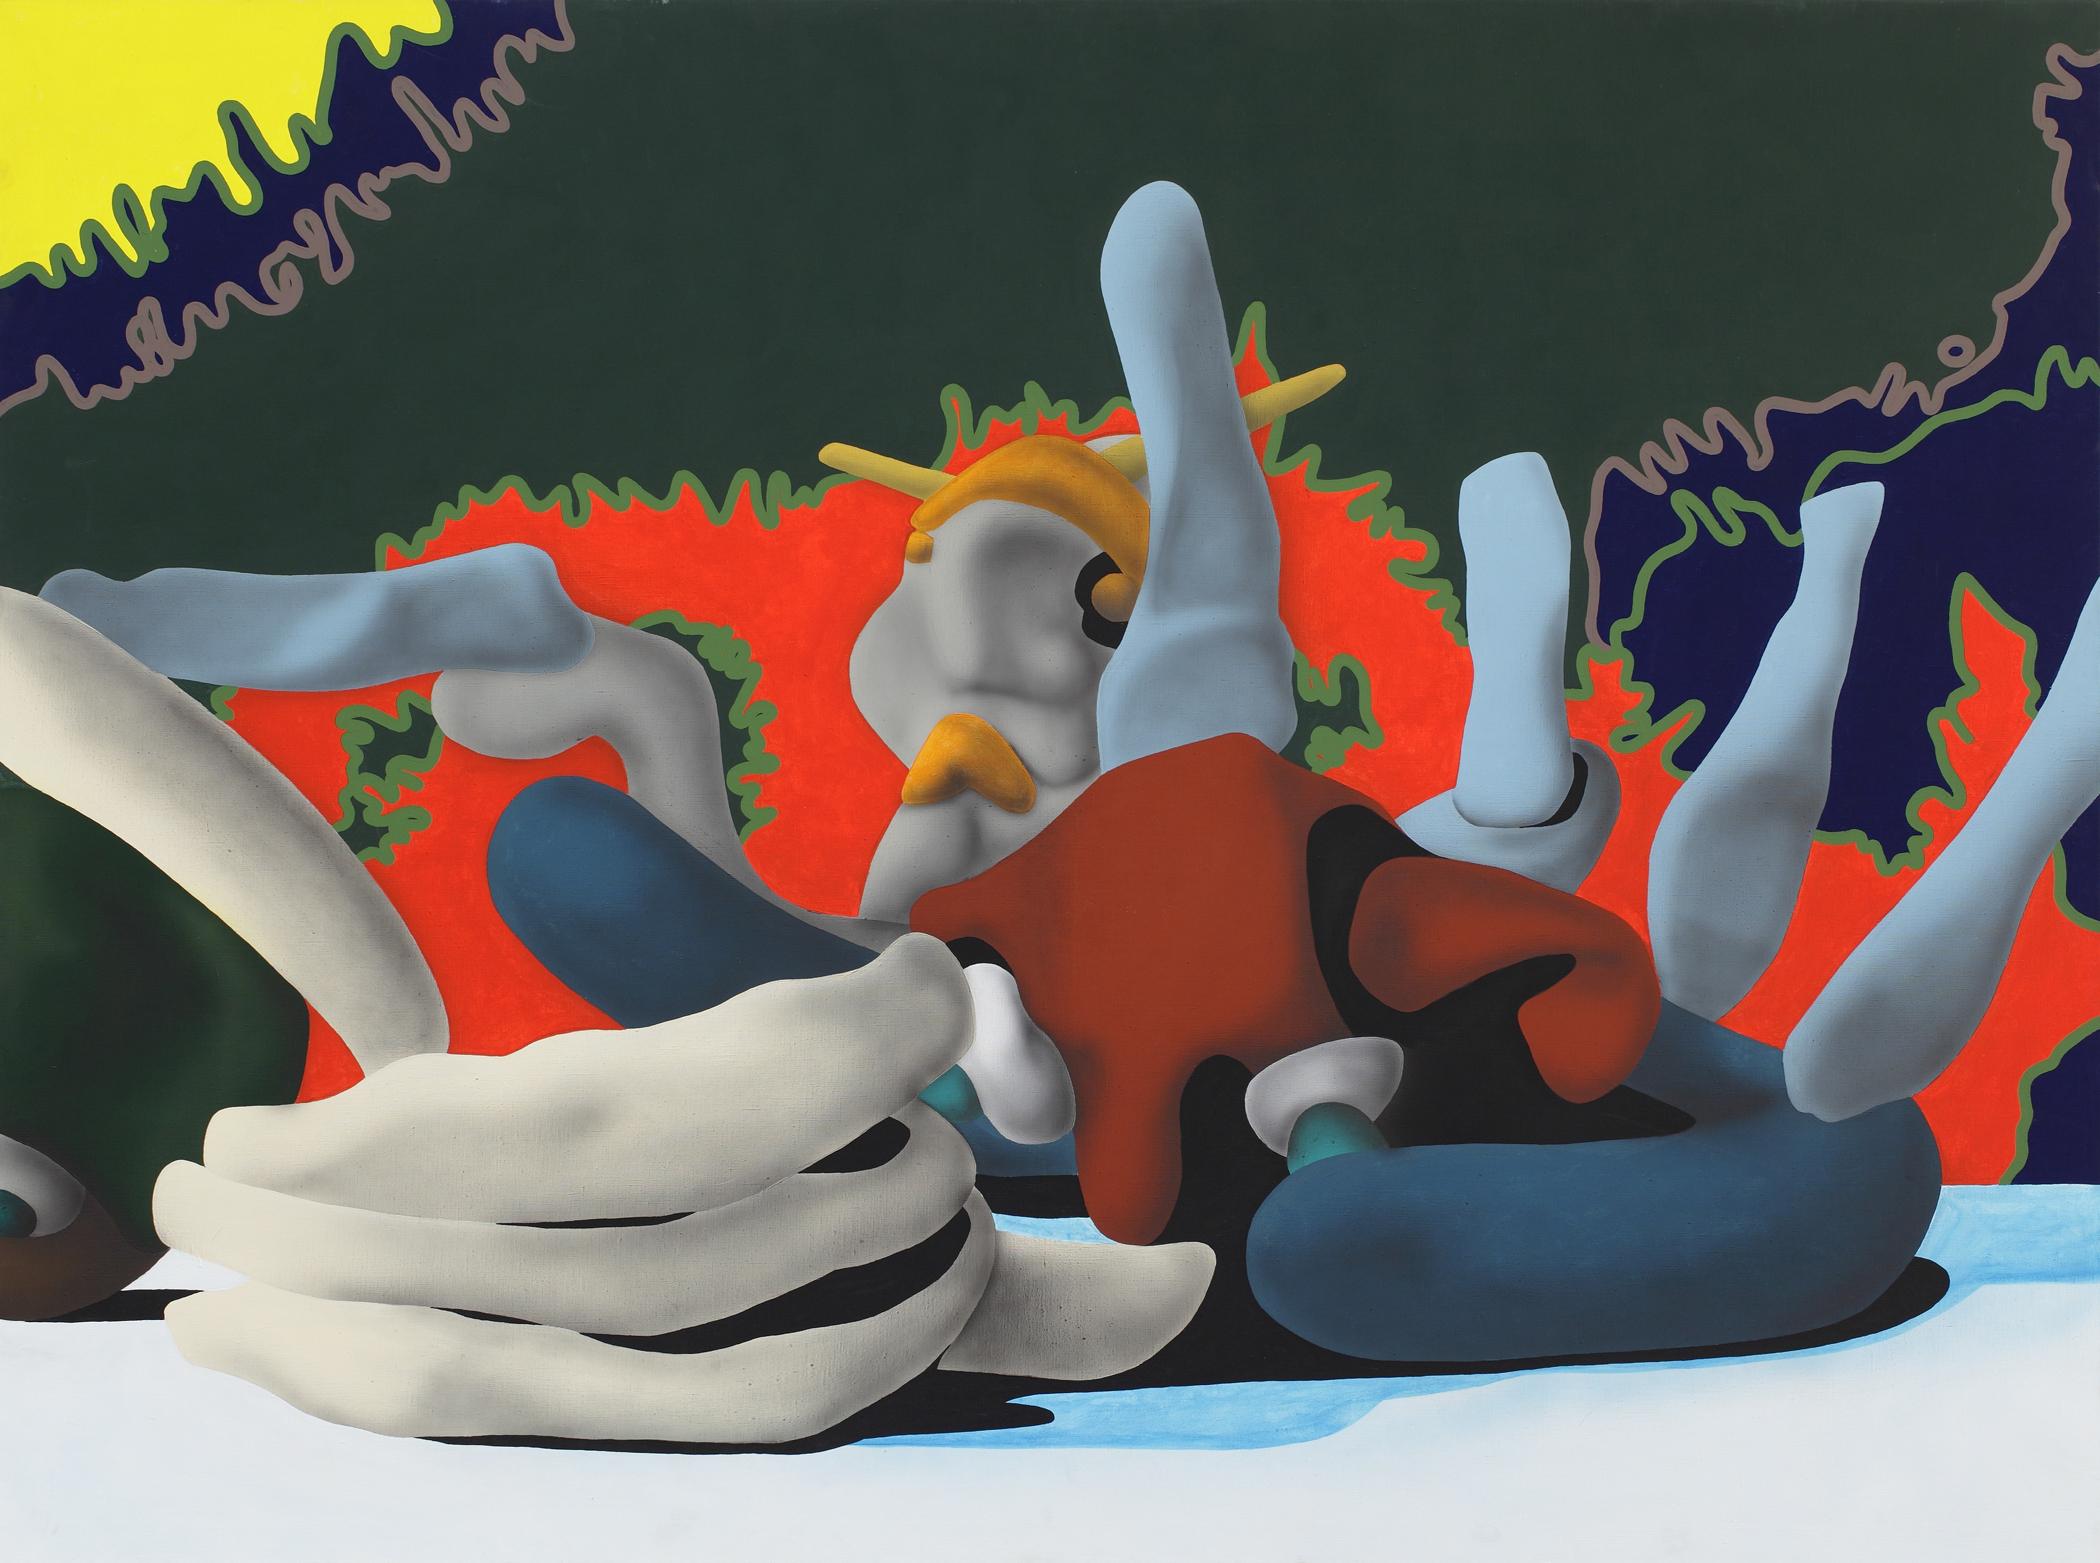 Fight, 2003, acrylic on canvas, 150 x 200 cm